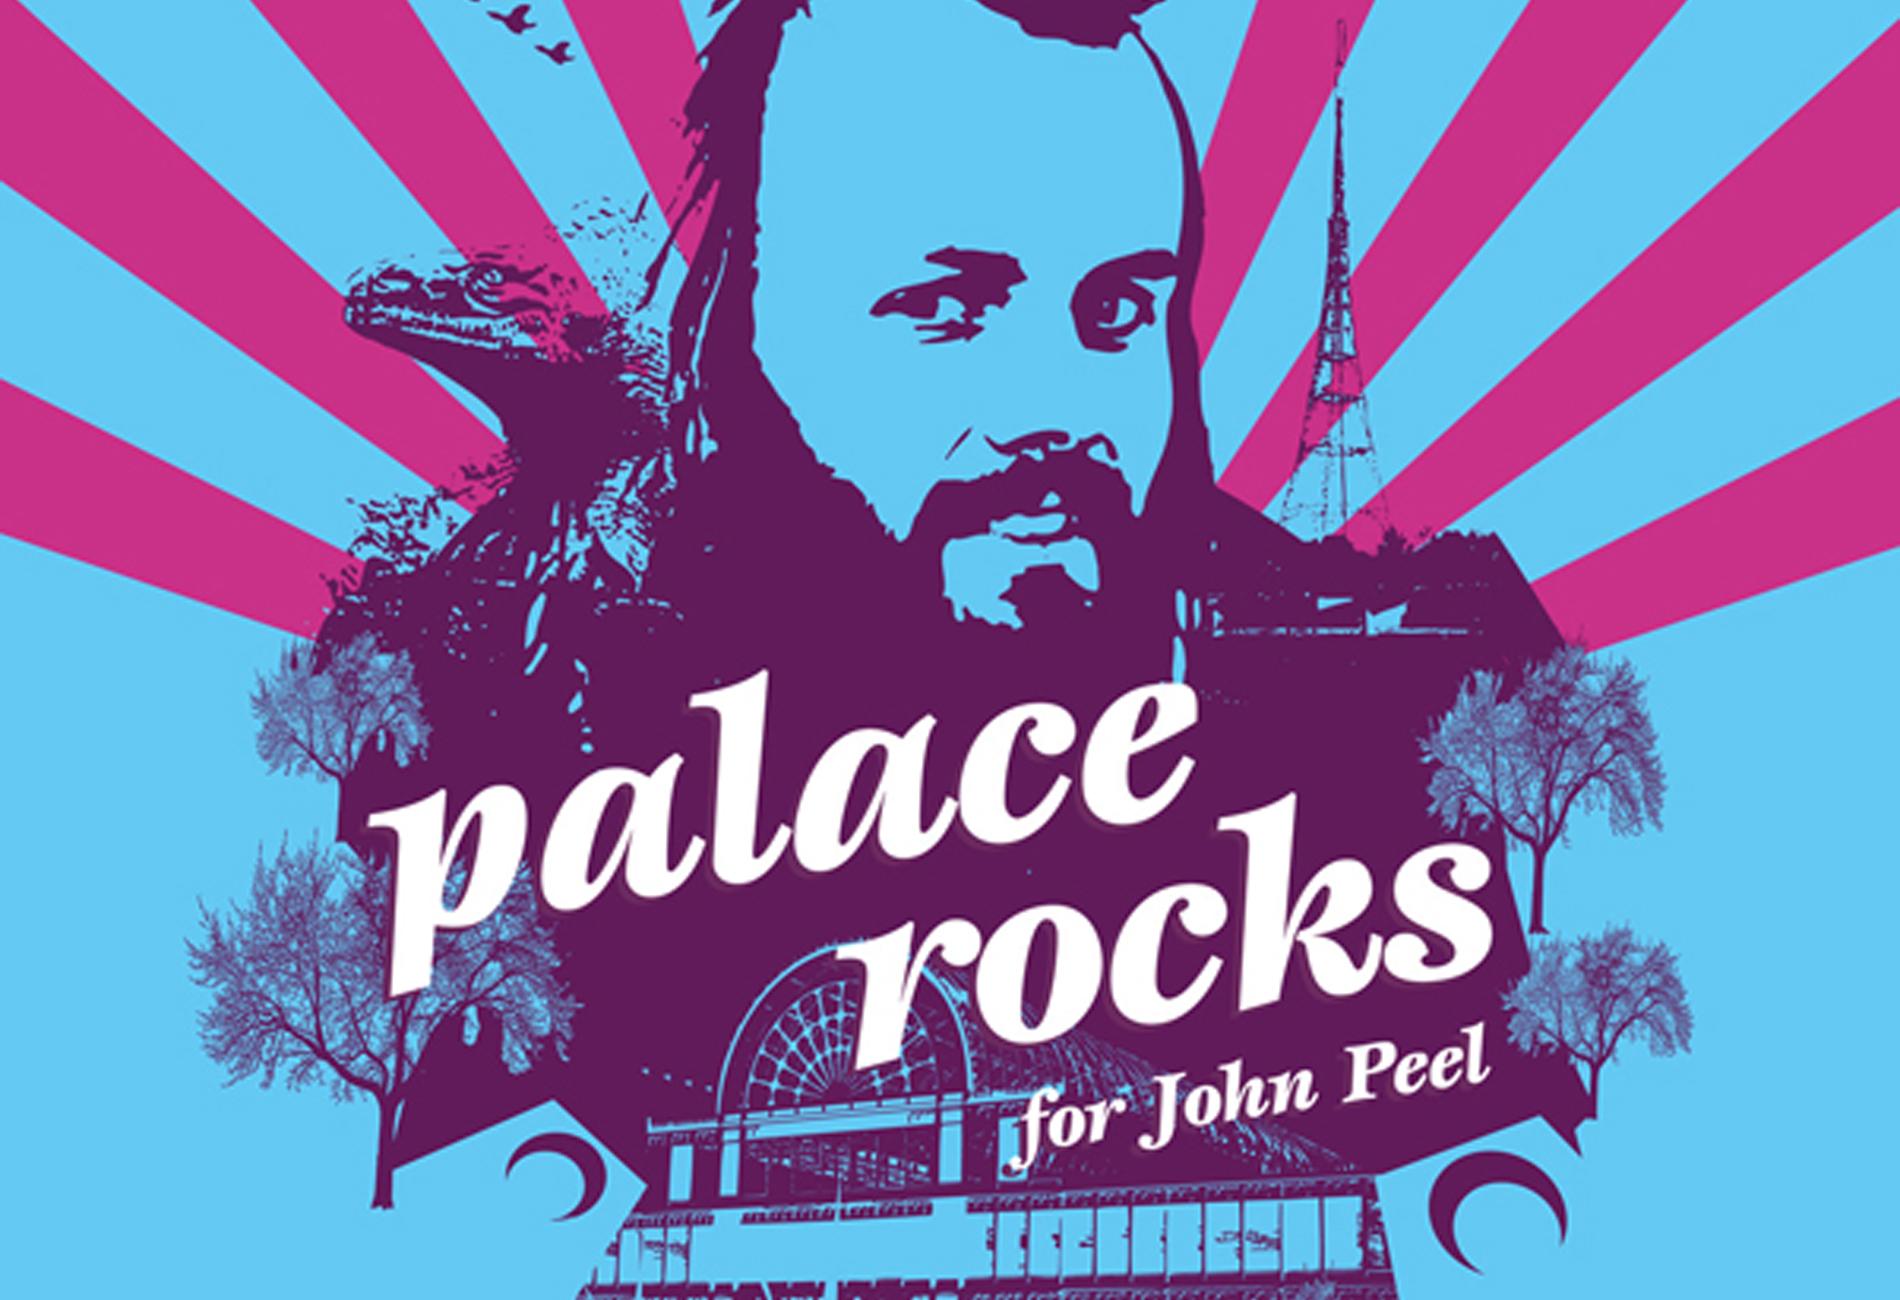 Palace Rocks DJ nights